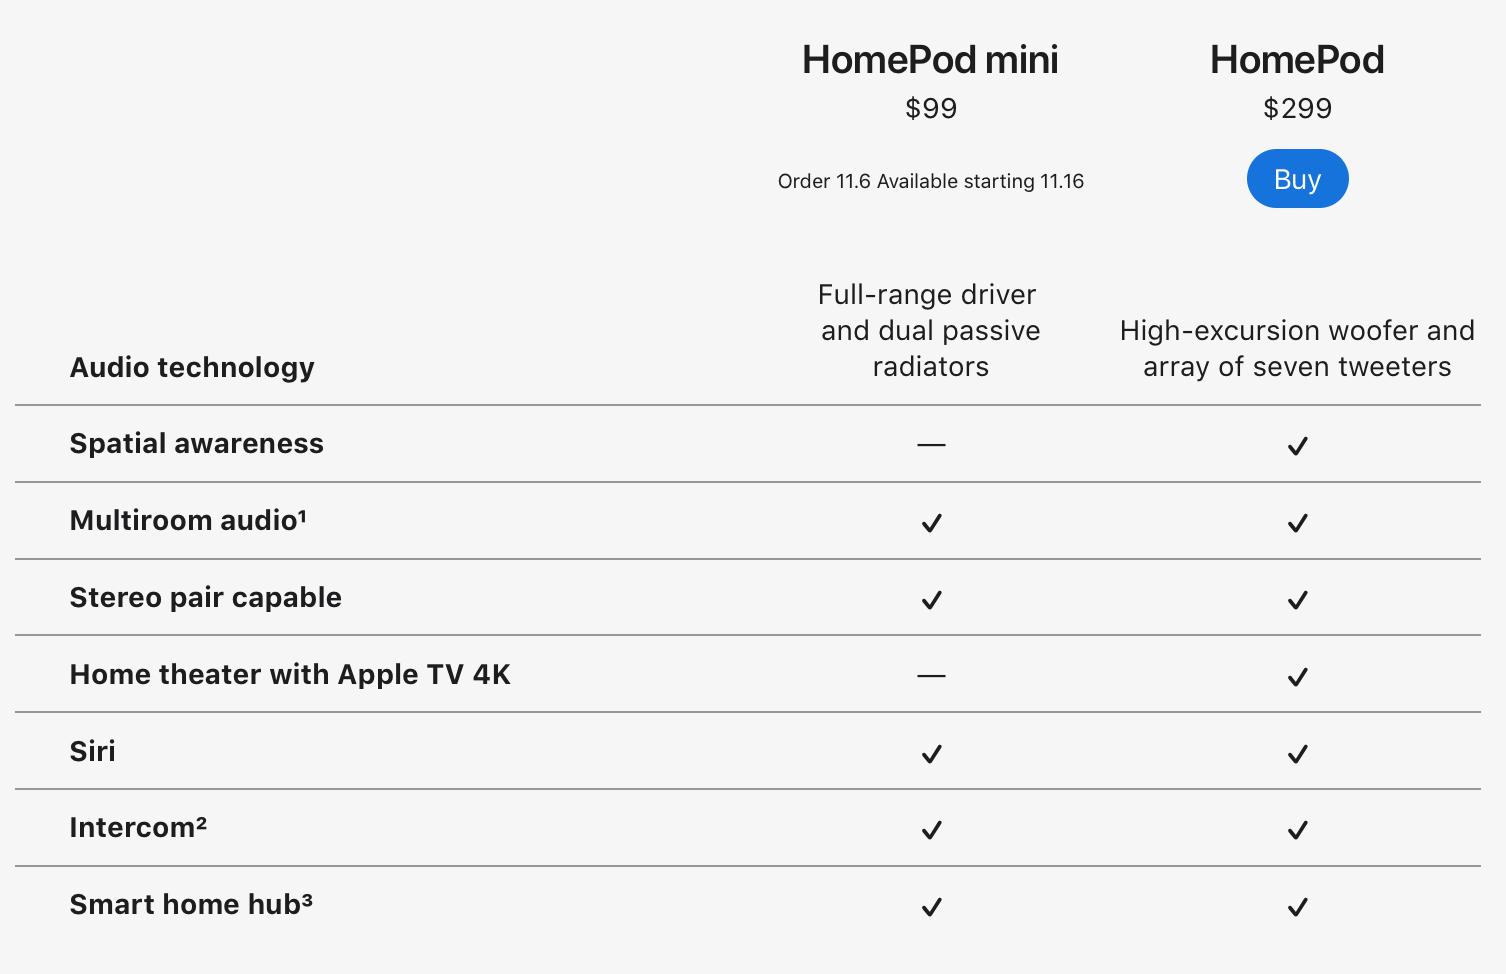 HomePod mini vs HomePod comparison